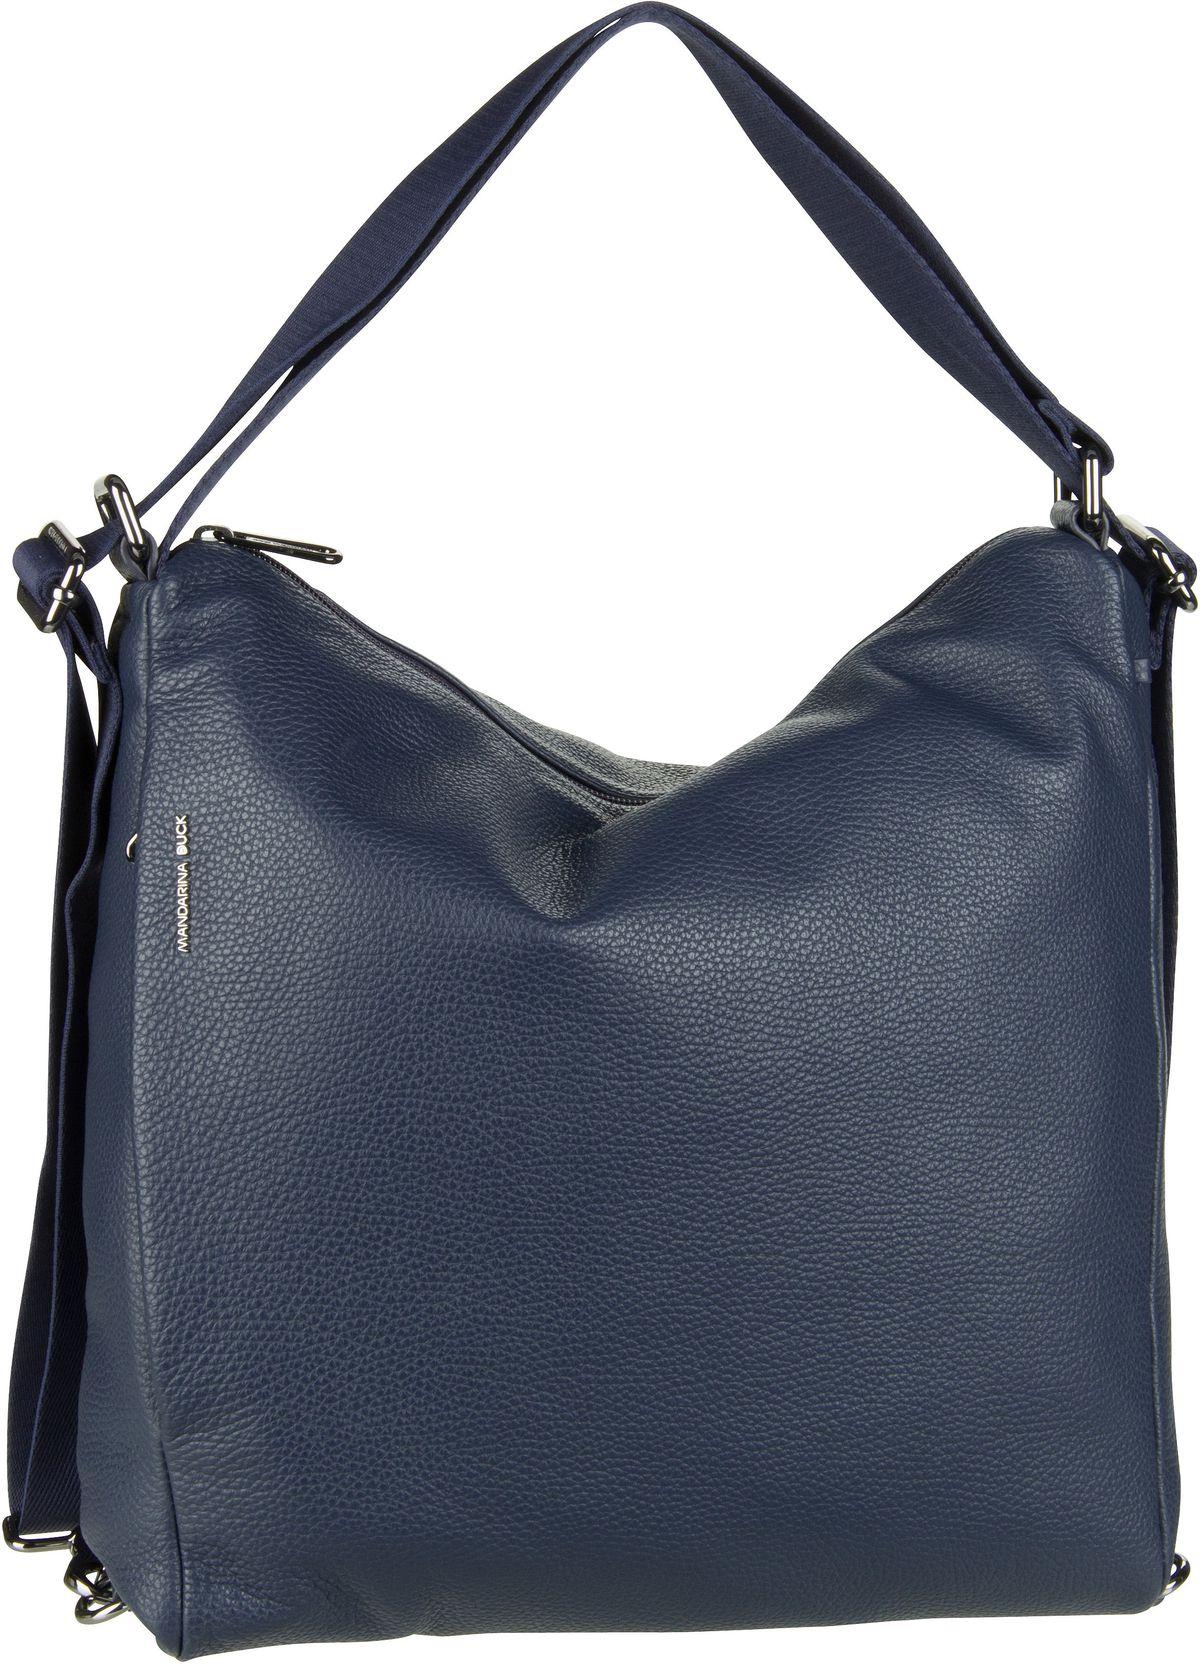 Handtasche Mellow Leather Hobo Backpack FZT72 Dress Blue